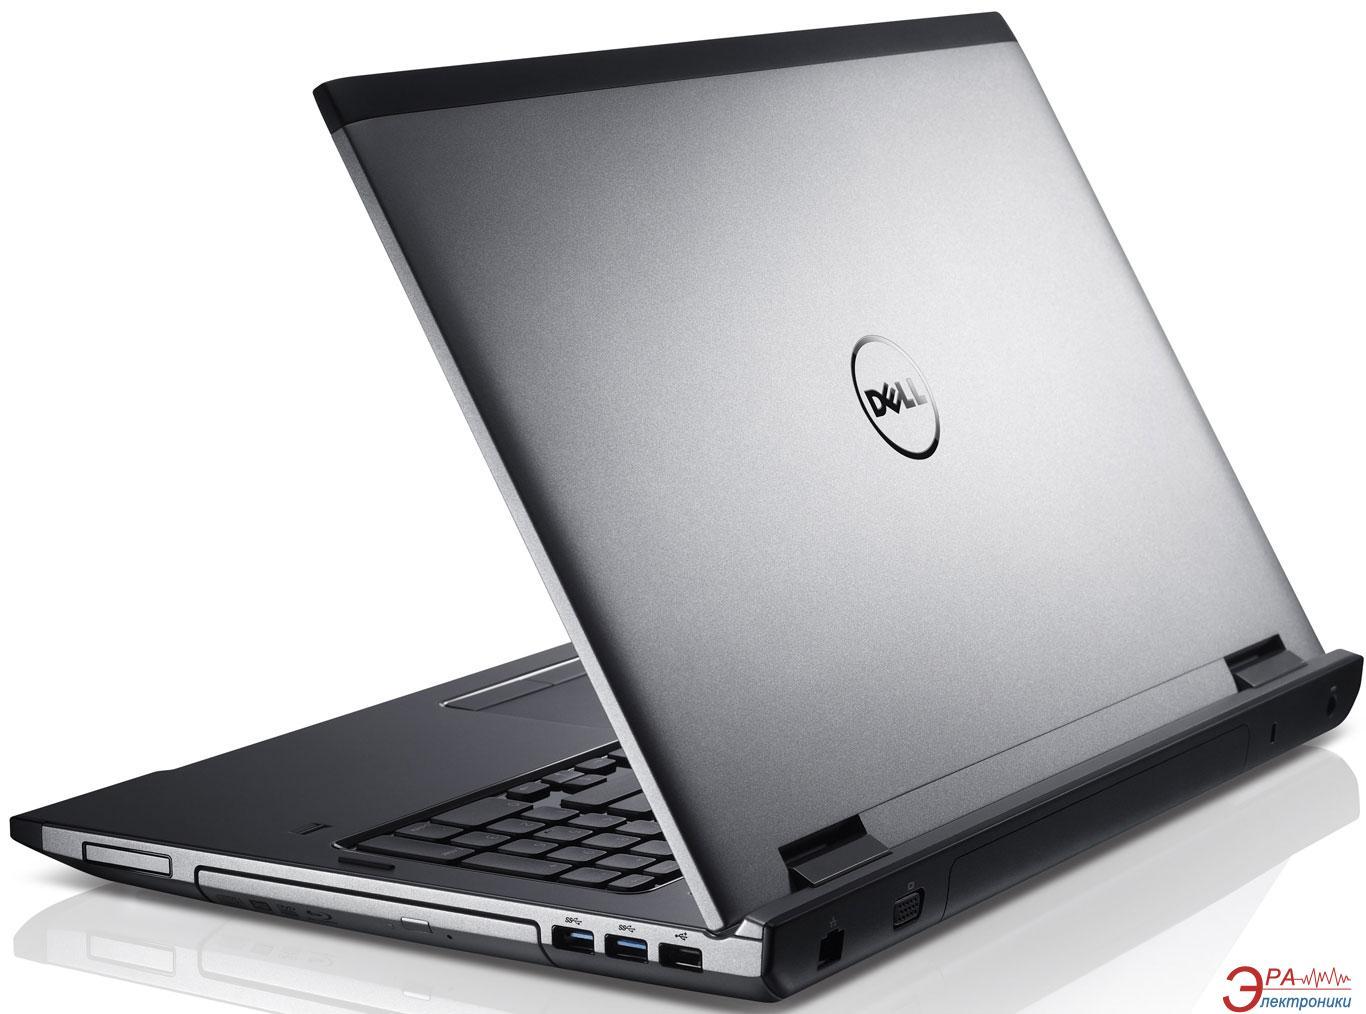 Ноутбук Dell Vostro 3750 (DV3750I241045007S) Aberdeen Silver 17,3